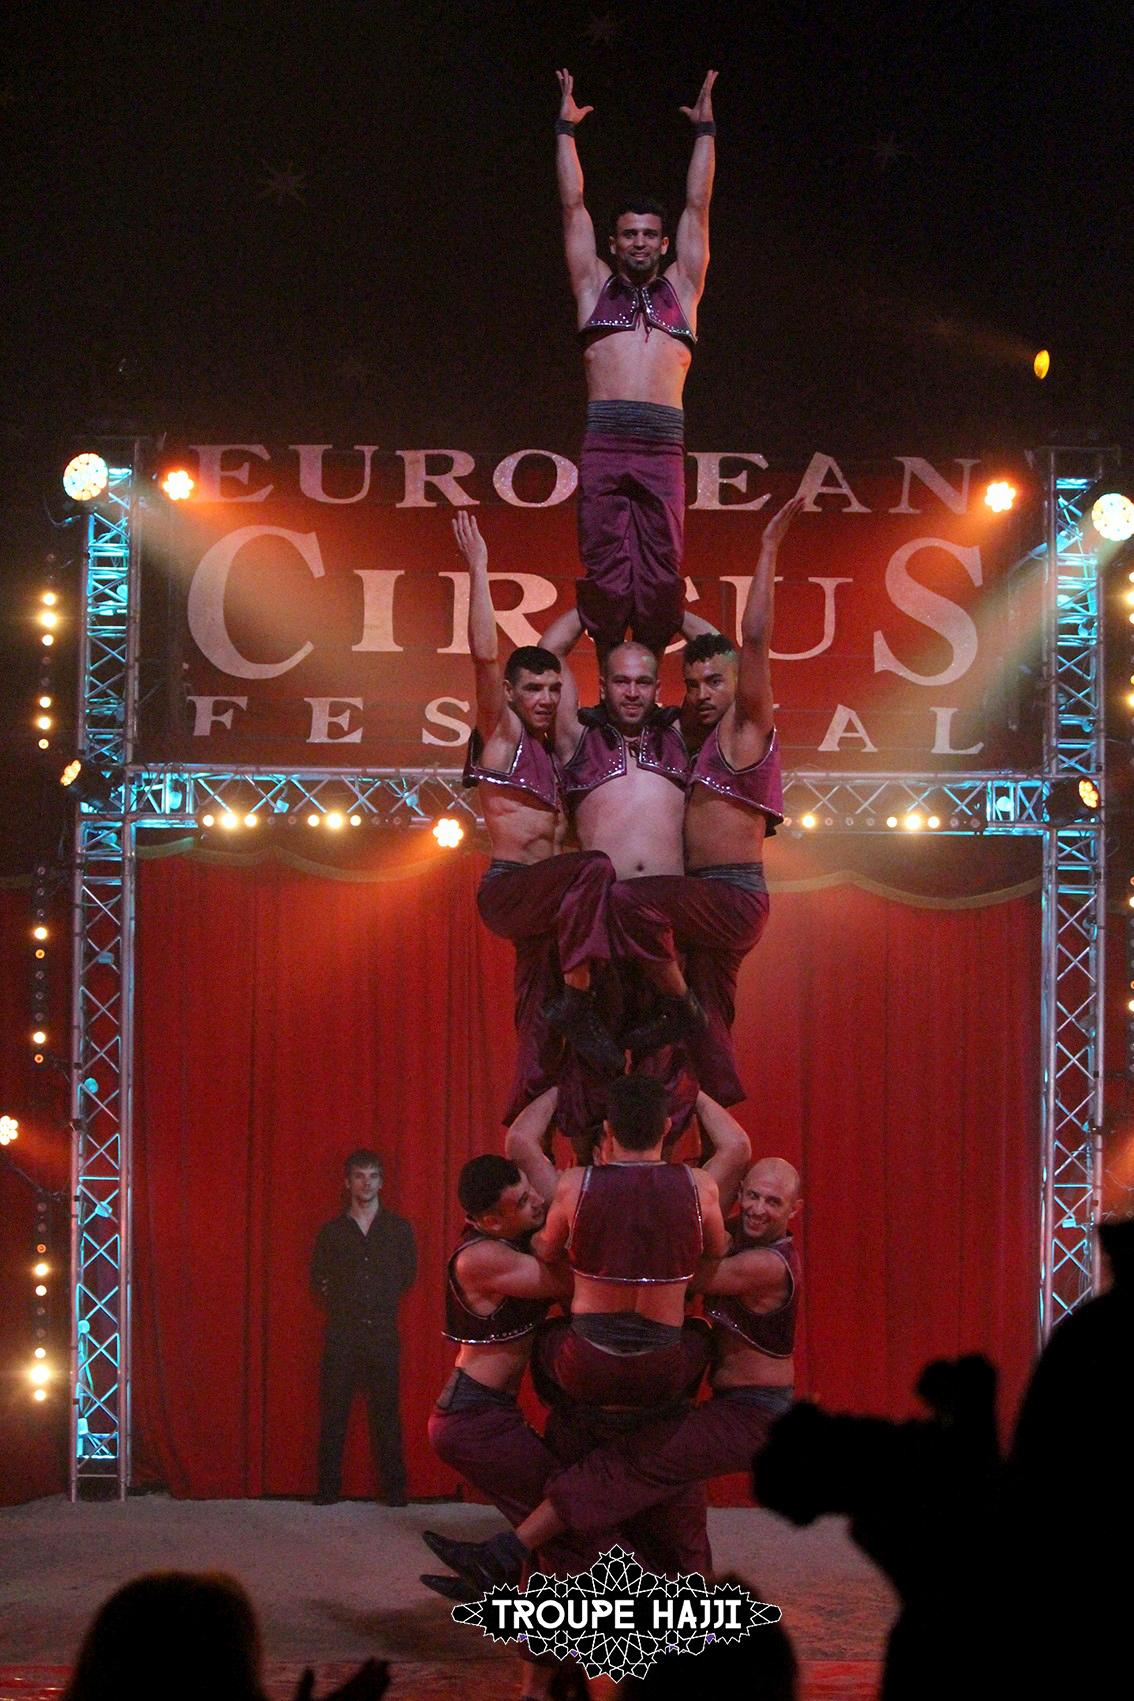 Troupe Hajji European Circus Festival